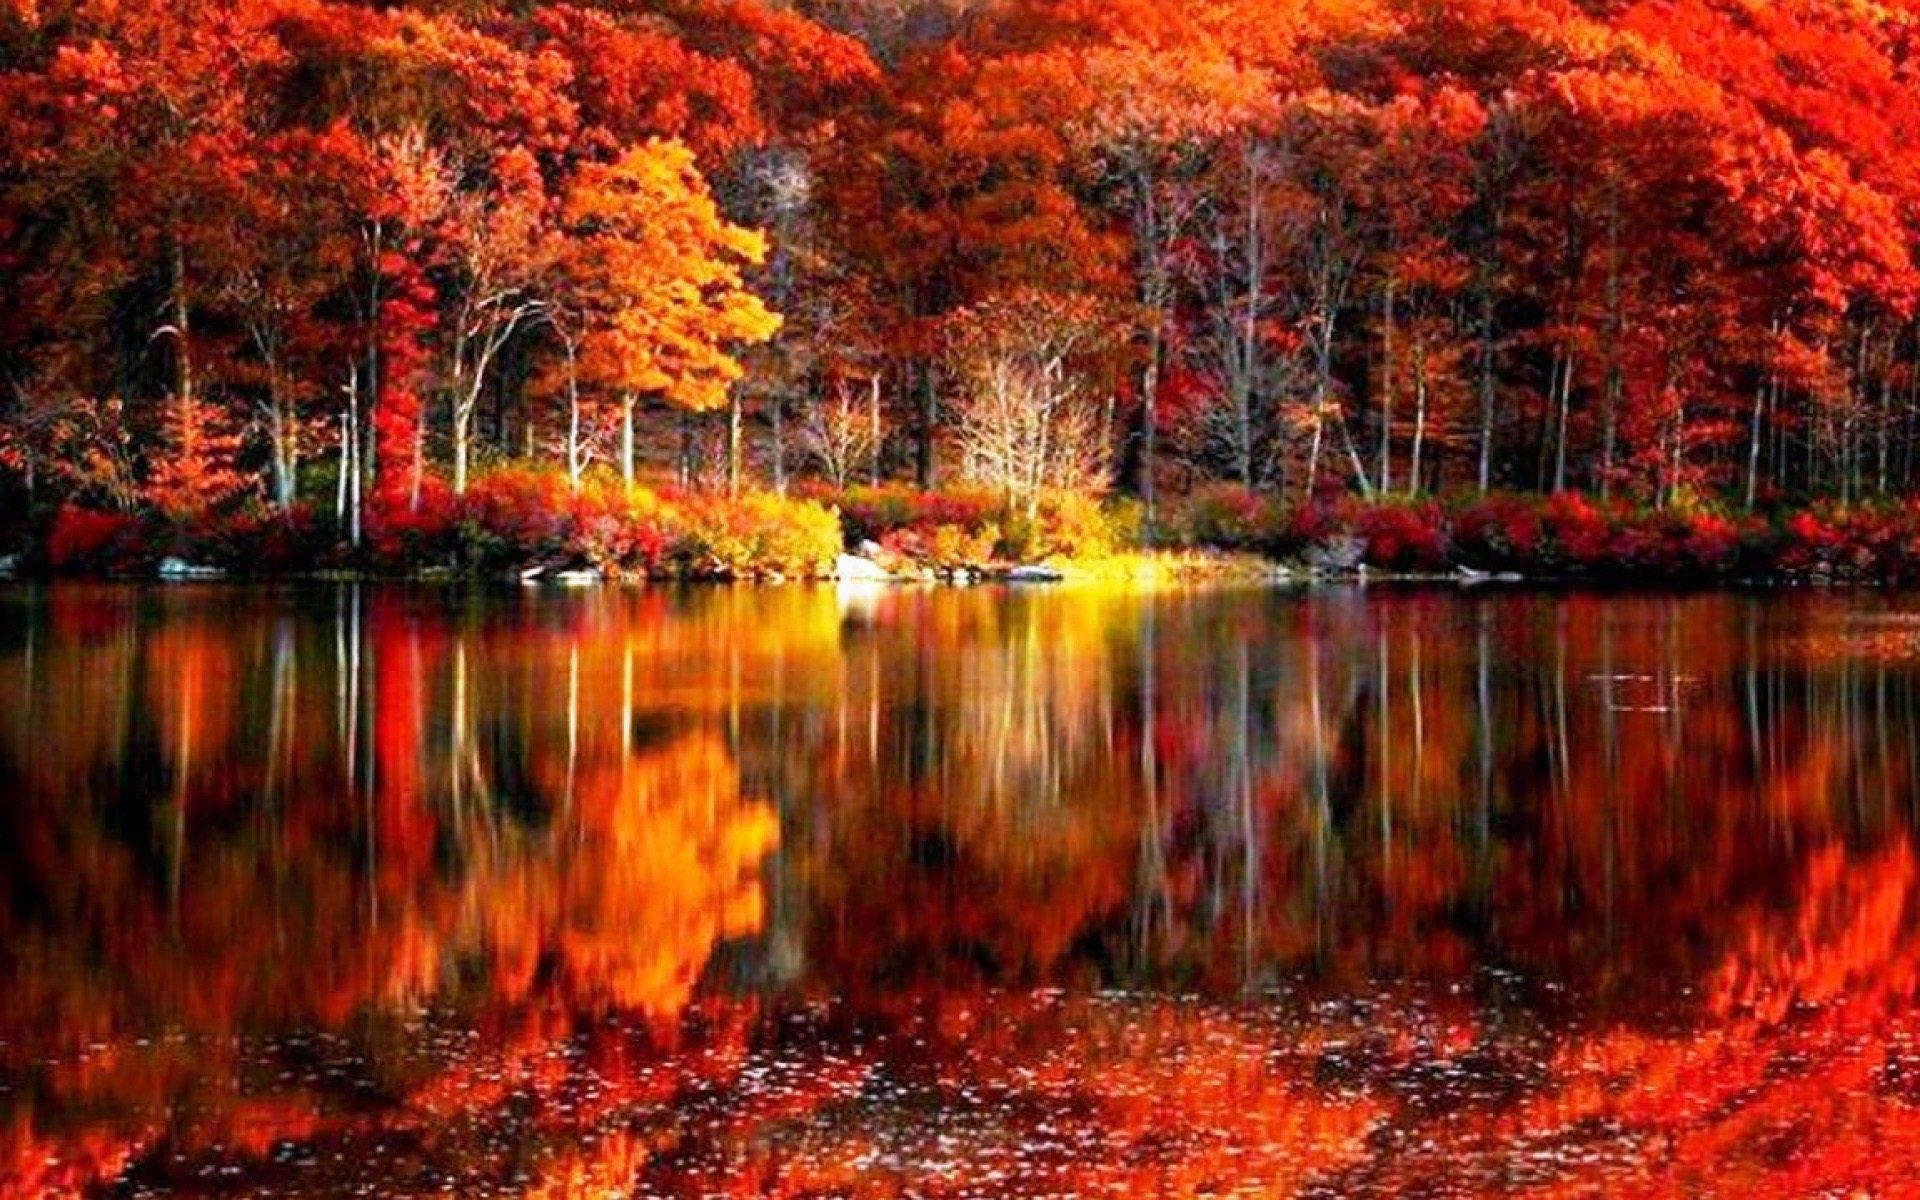 fall foliage wallpaper free download. - media file | pixelstalk